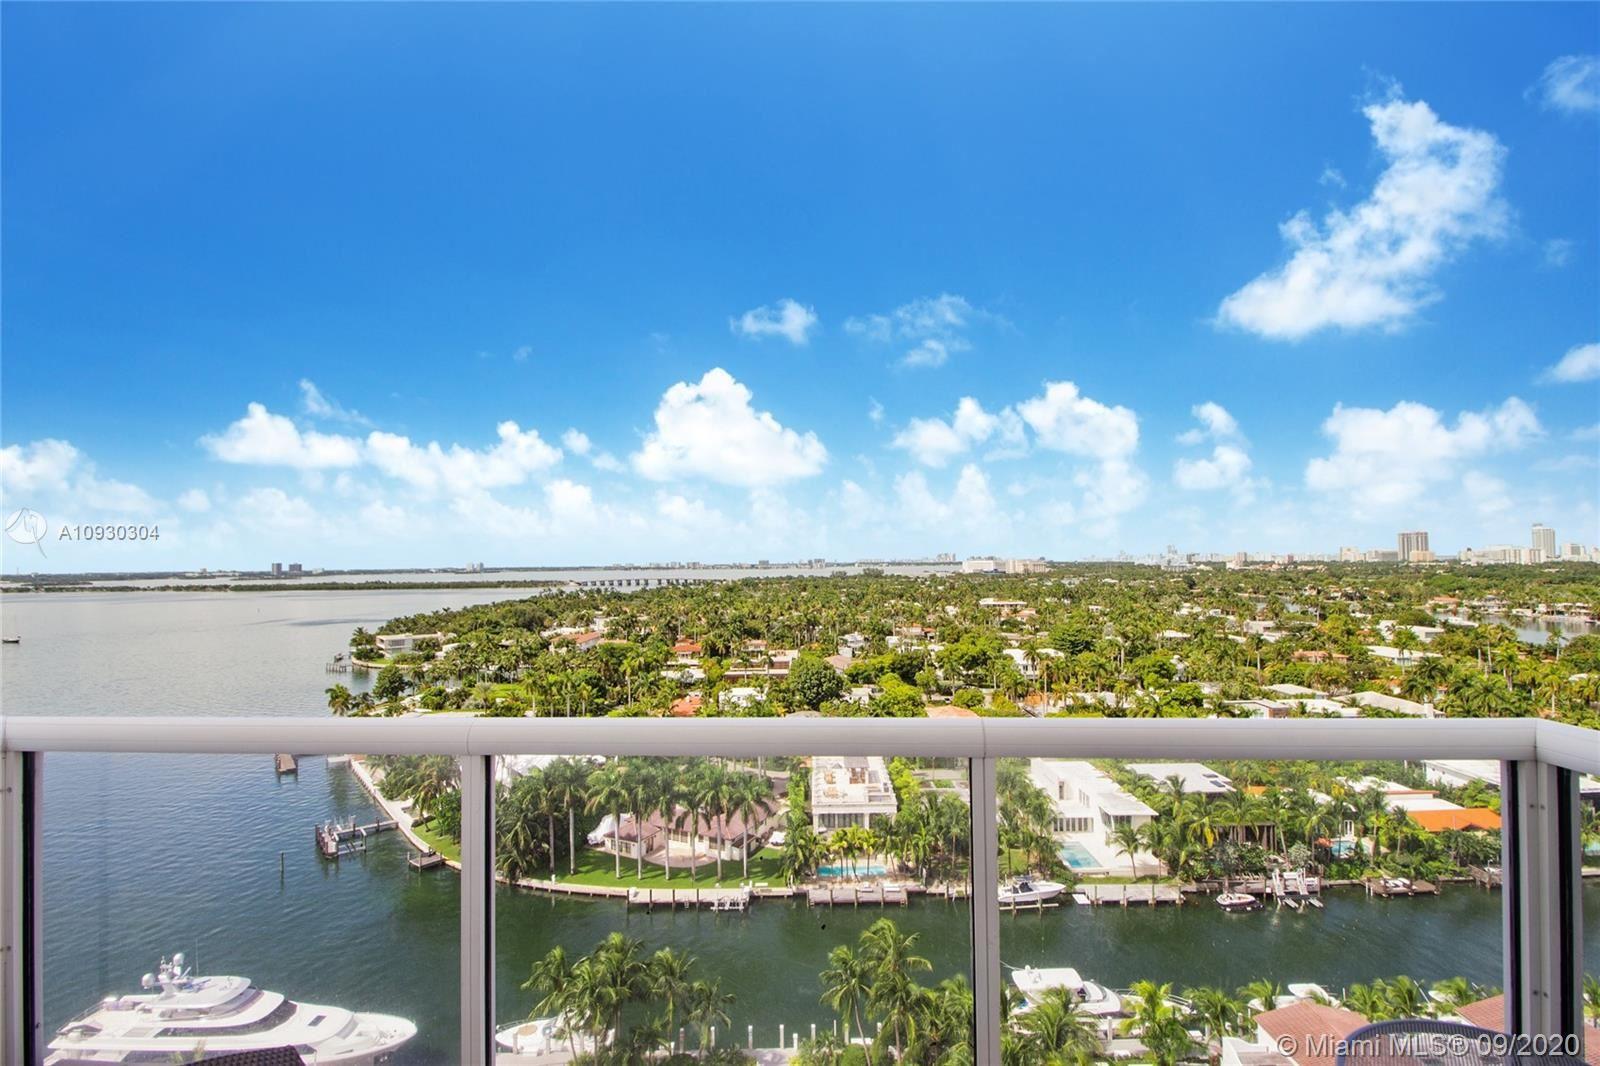 1900 Sunset Harbour Dr #1801, Miami Beach, FL 33139 - #: A10930304